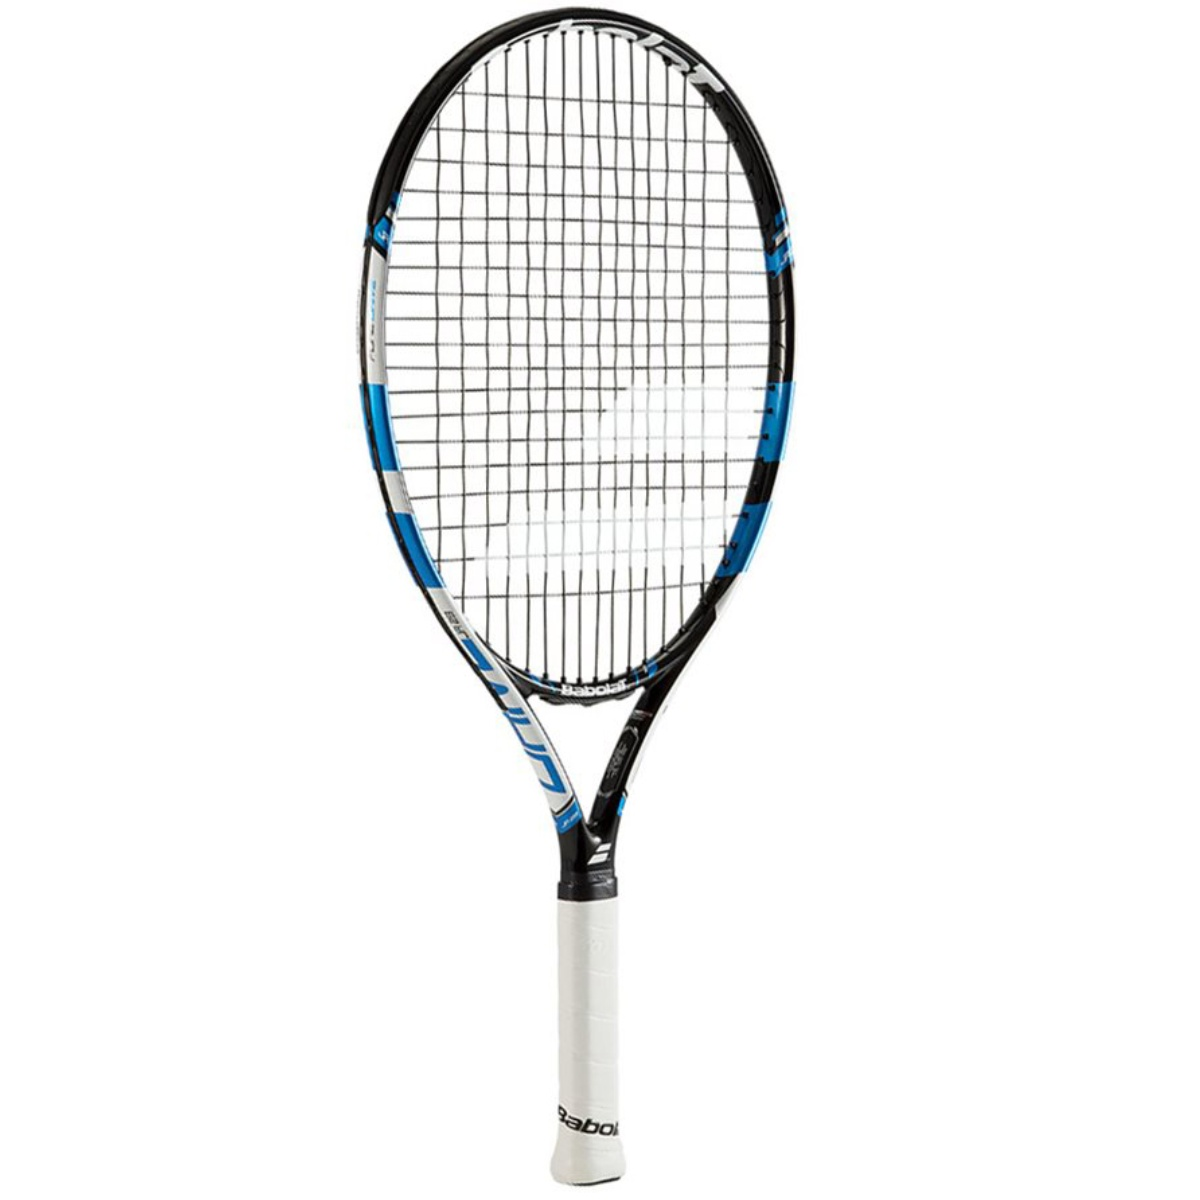 Tenisová raketa BABOLAT Pure Drive Junior 2016 modrá - vel. 25